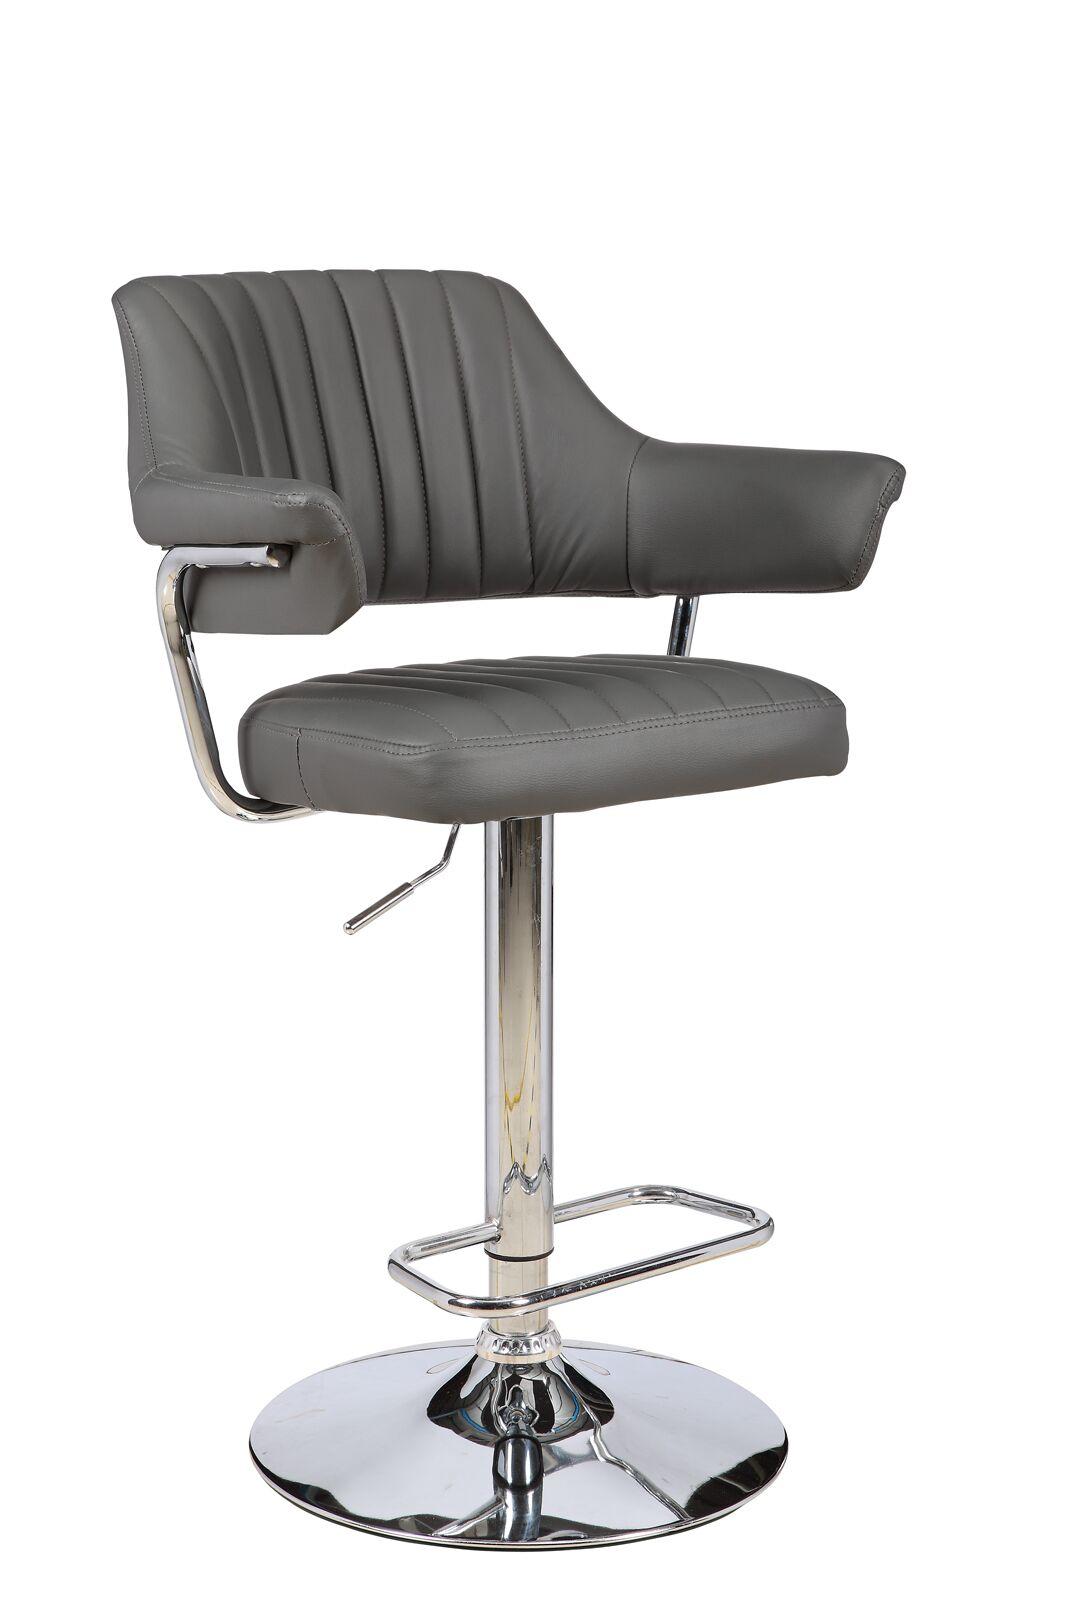 Castlethorpe Series Adjustable Height Swivel Bar Stool Upholstery: Gray